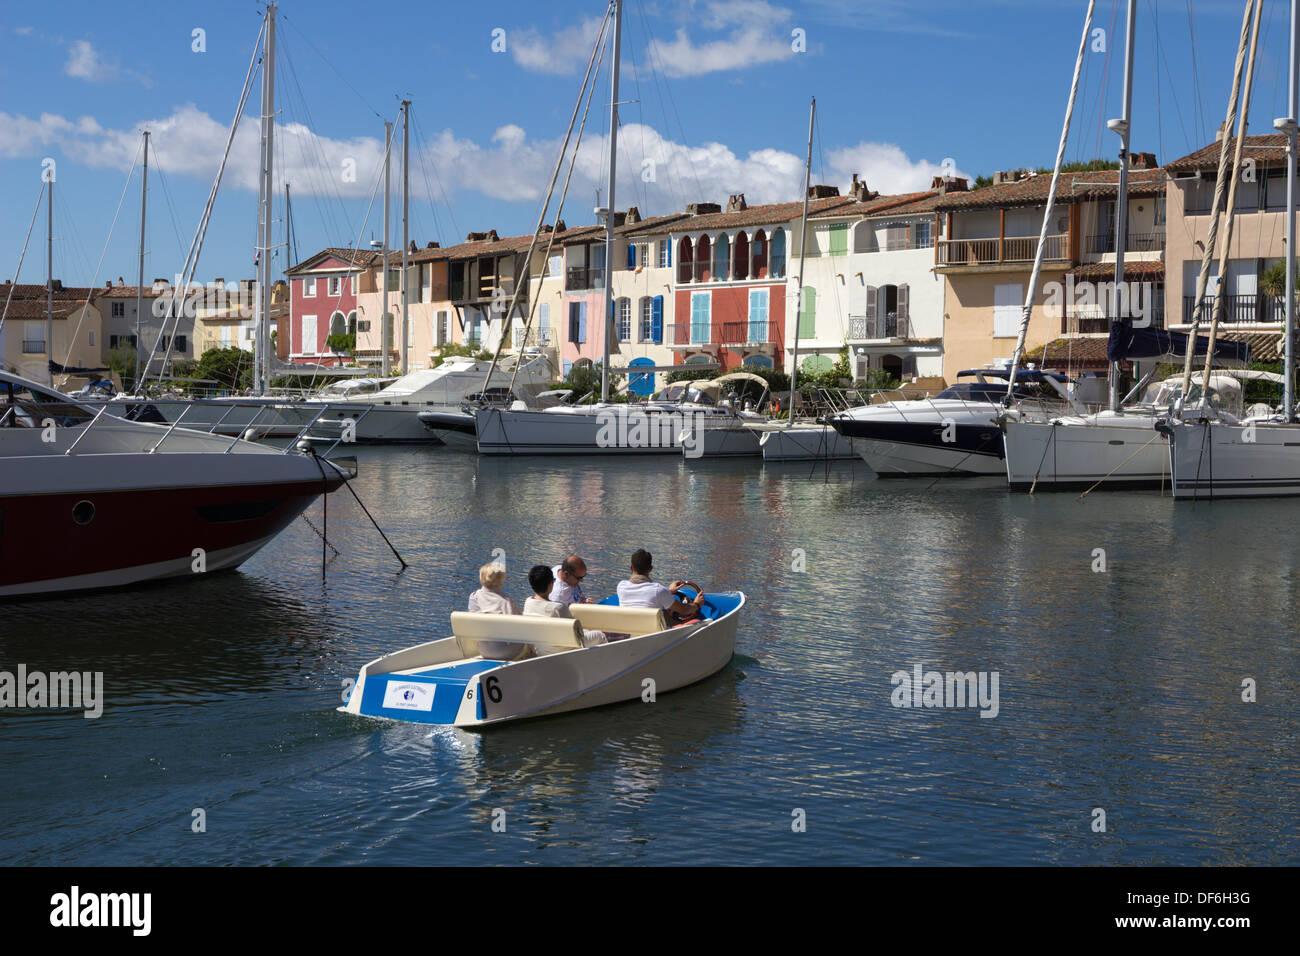 Port Grimaud, Var, Provence-Alpes-Cote d'Azur, France, Europe - Stock Image